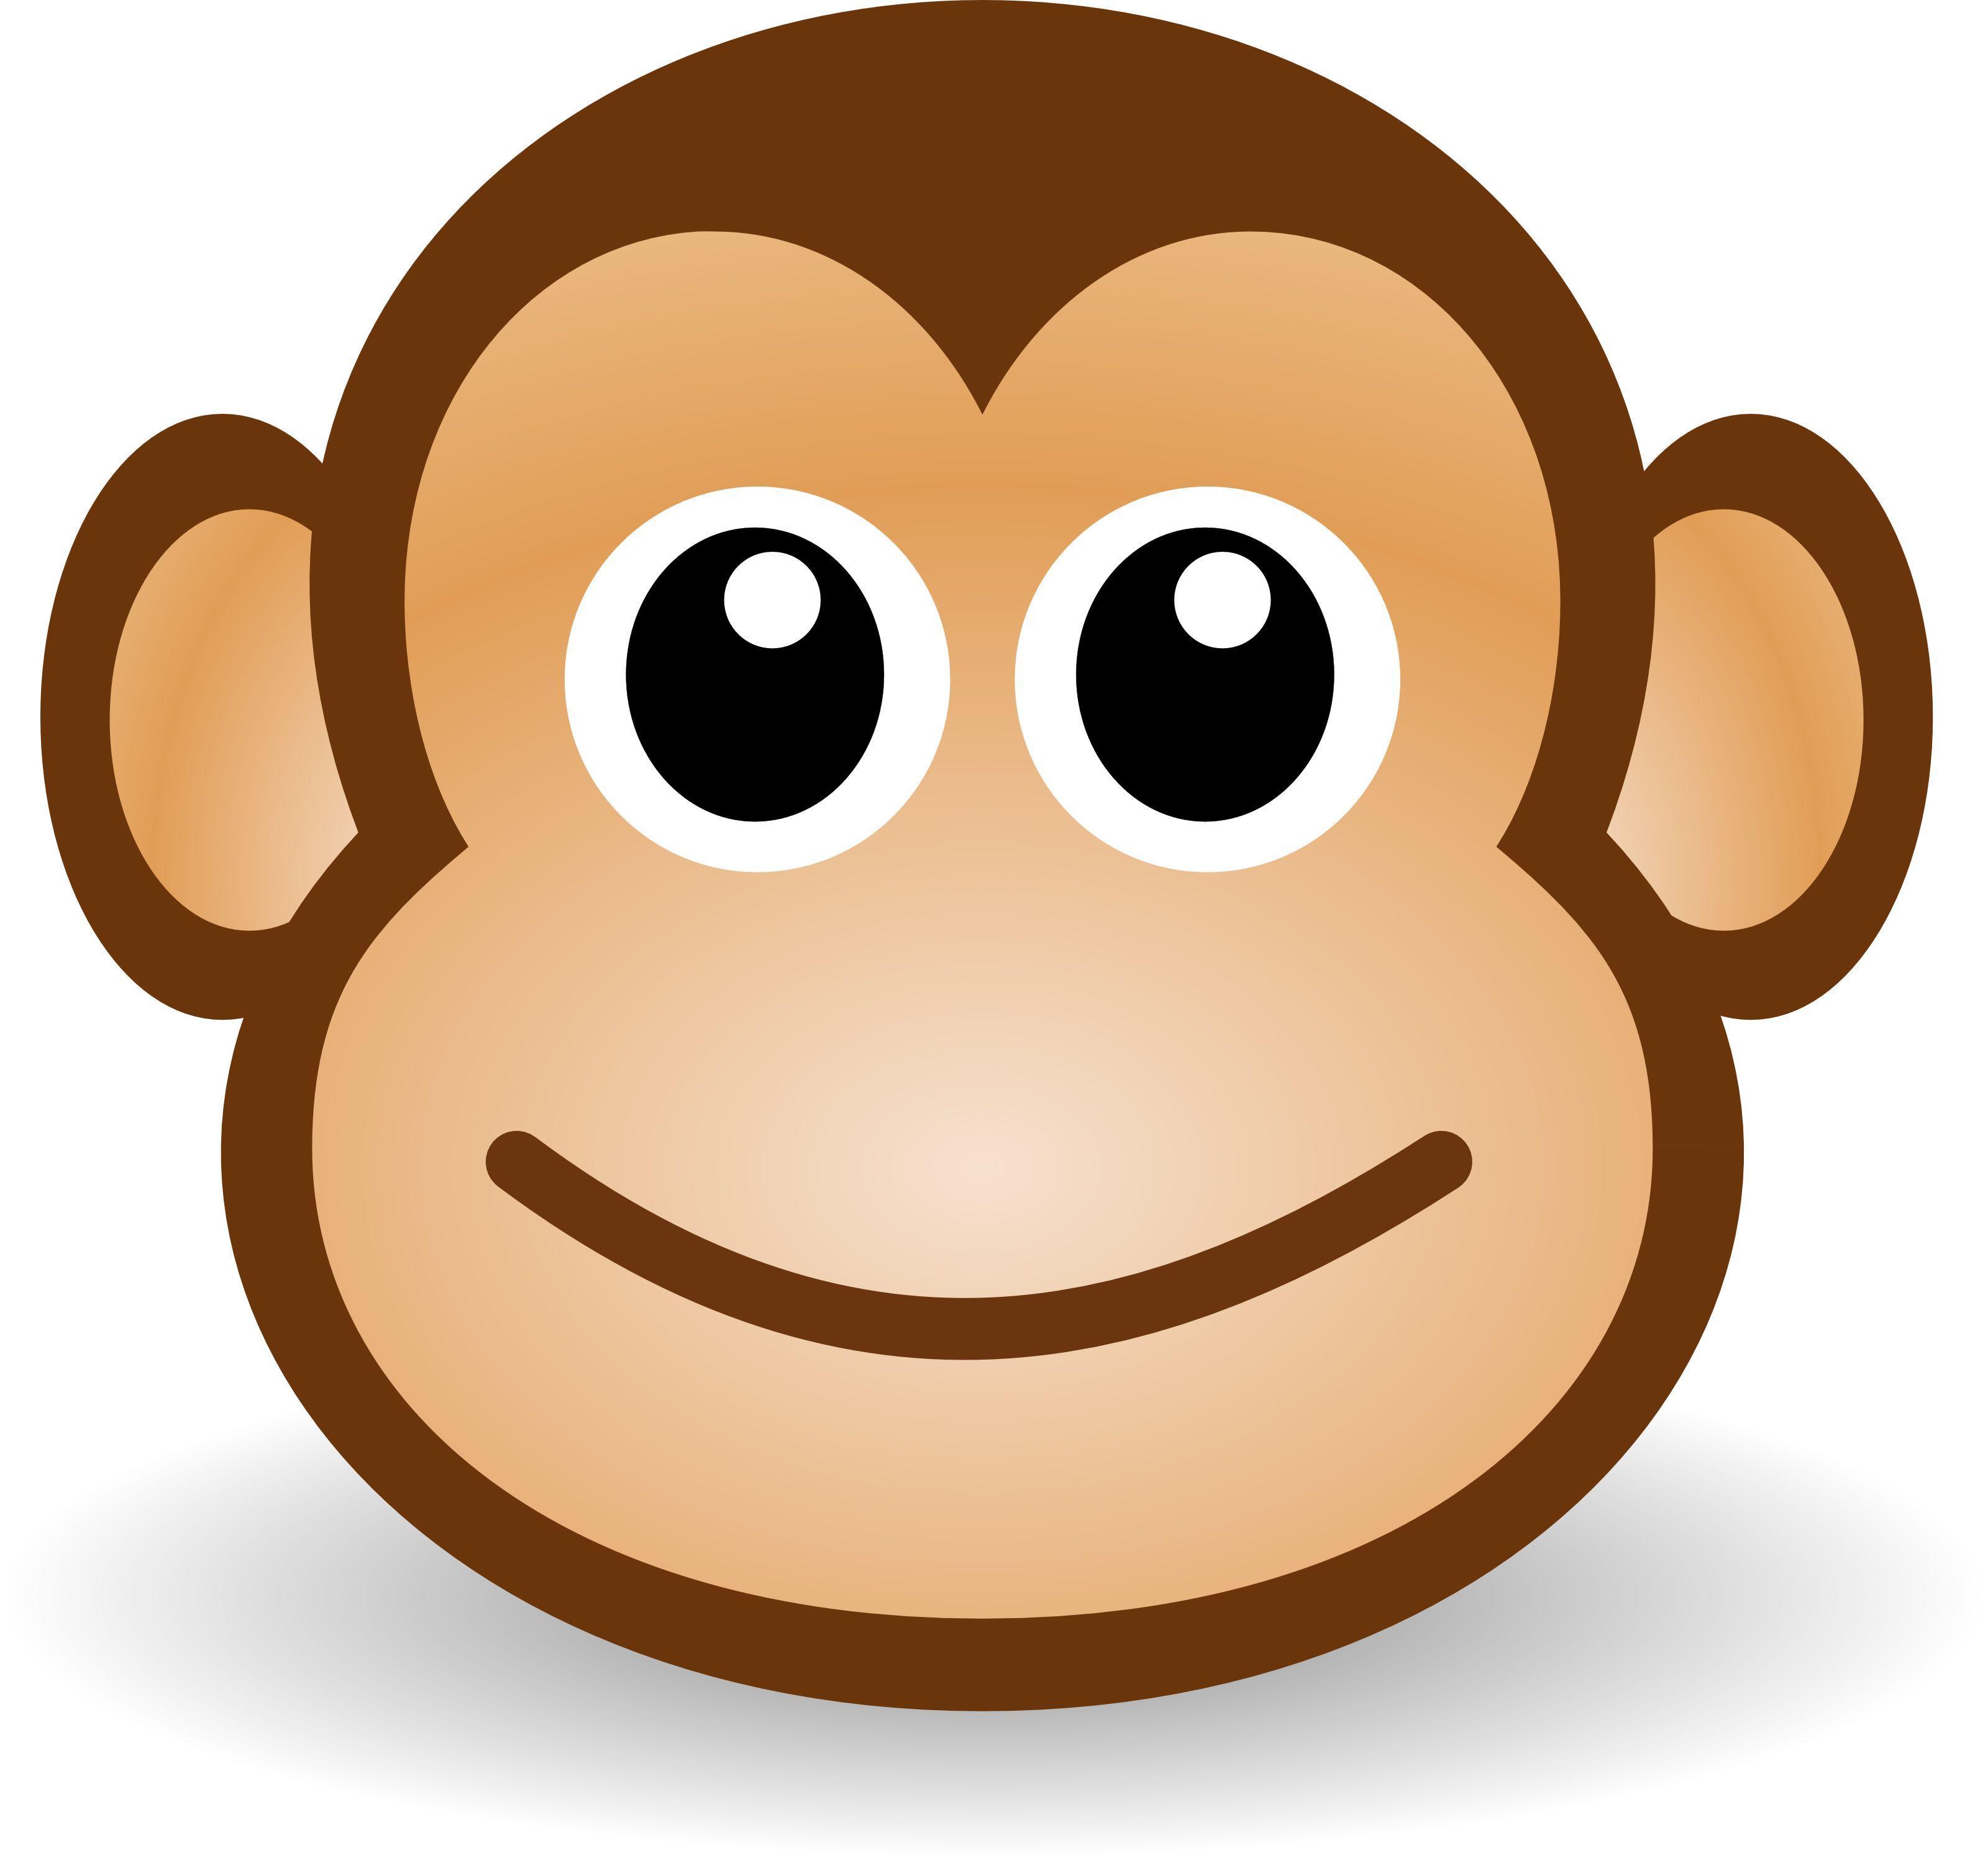 monkey cartoon wallpaper - photo #35